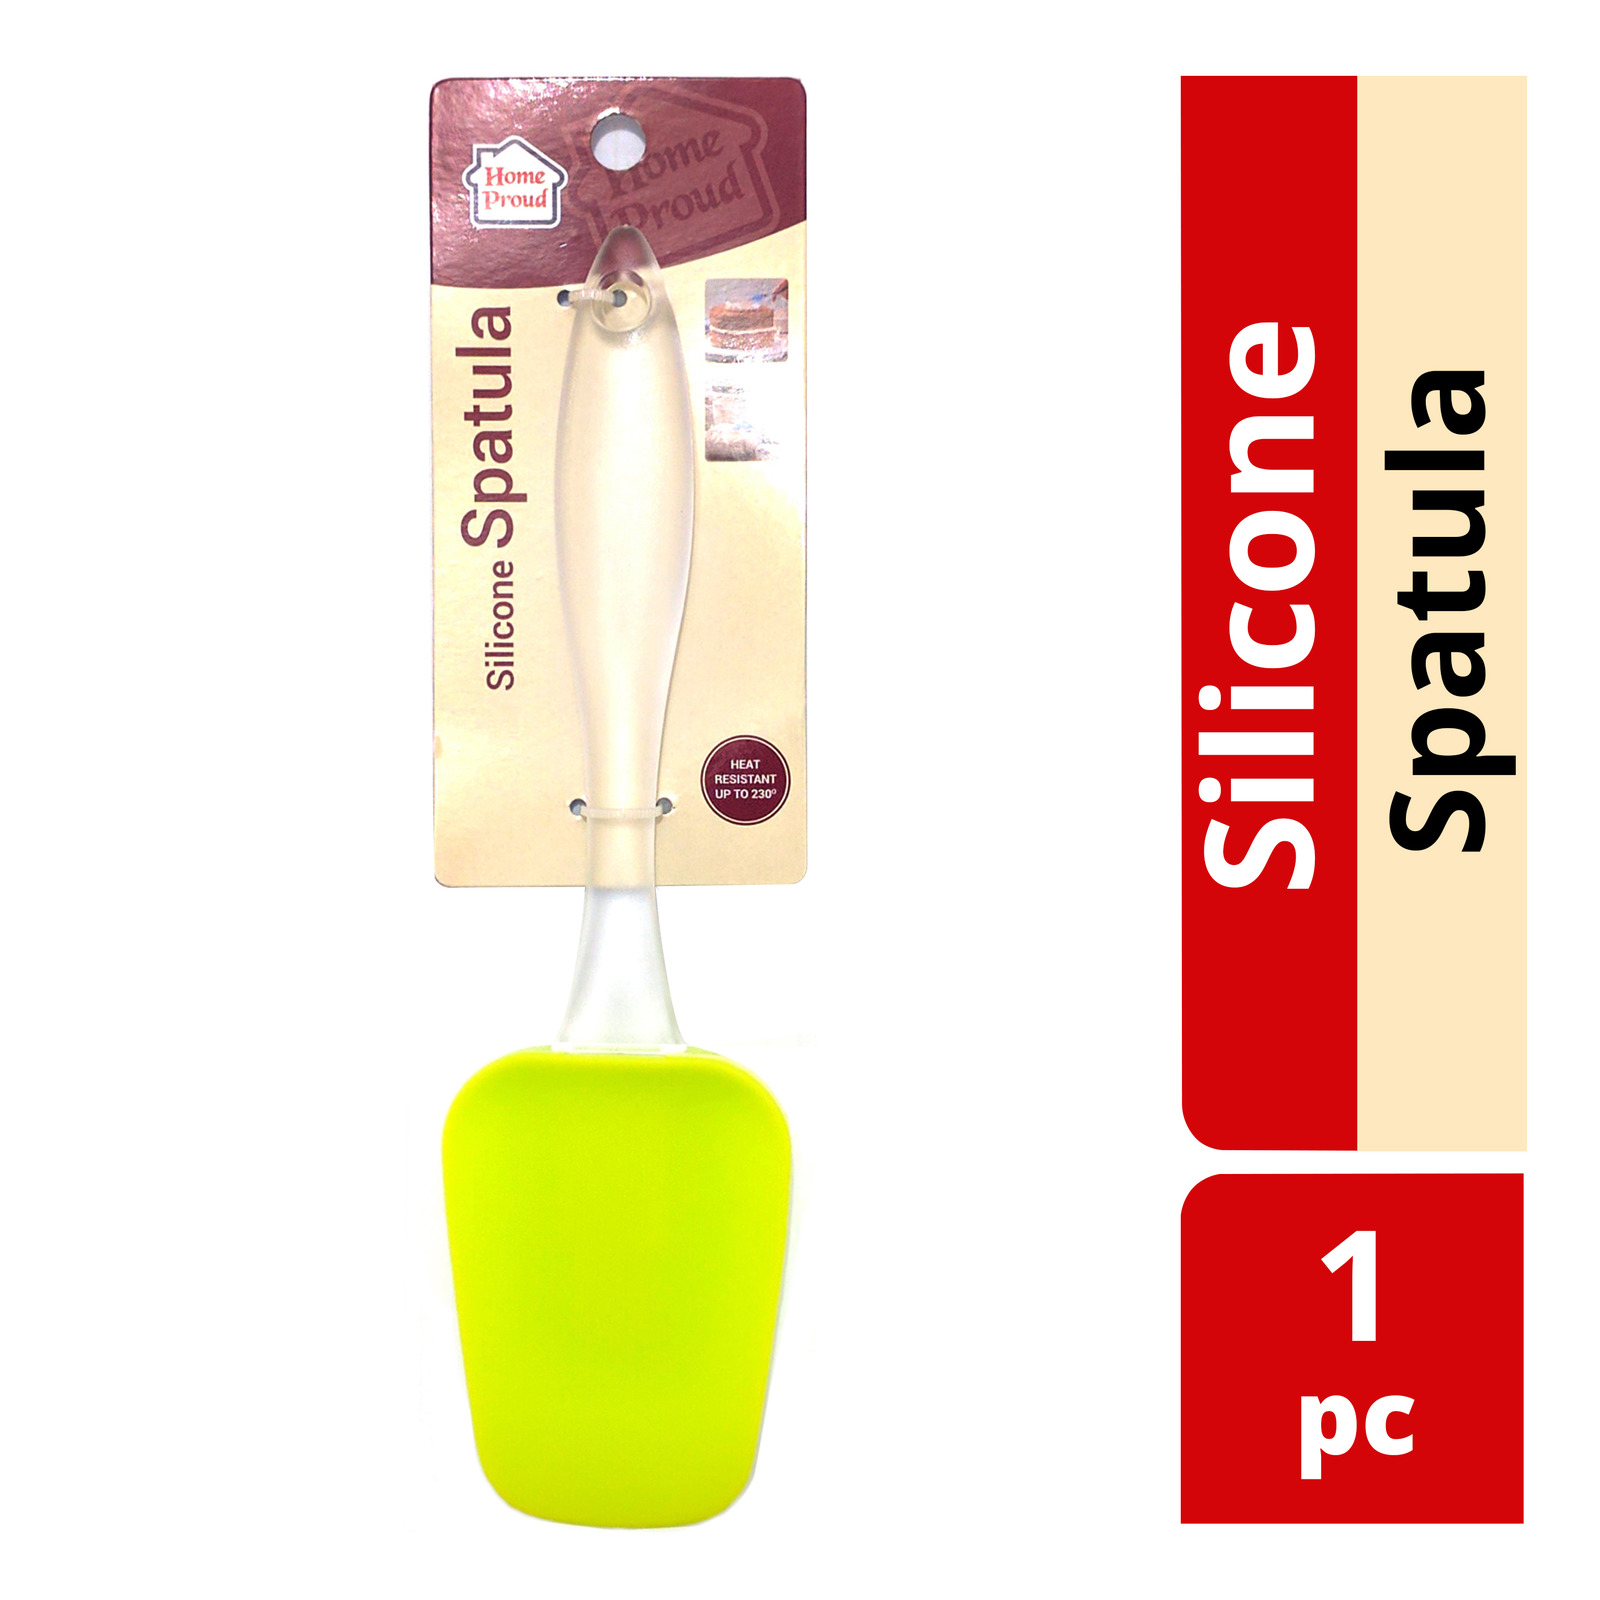 HomeProud Silicone Spatula